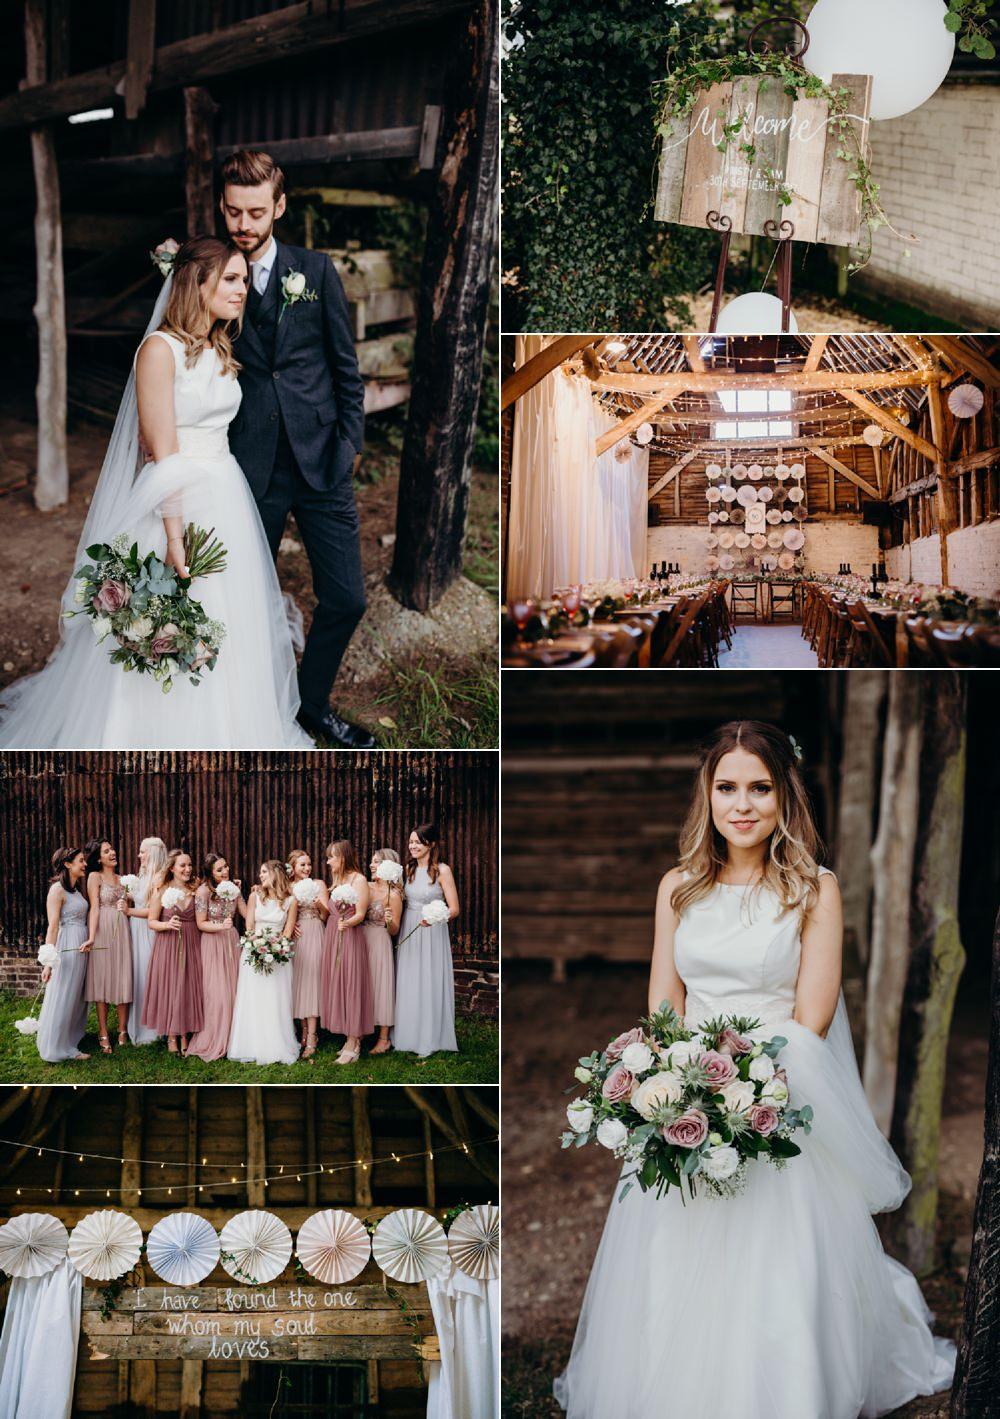 Incredibly Creative Boho DIY Barn Wedding Beard and Mane Photography